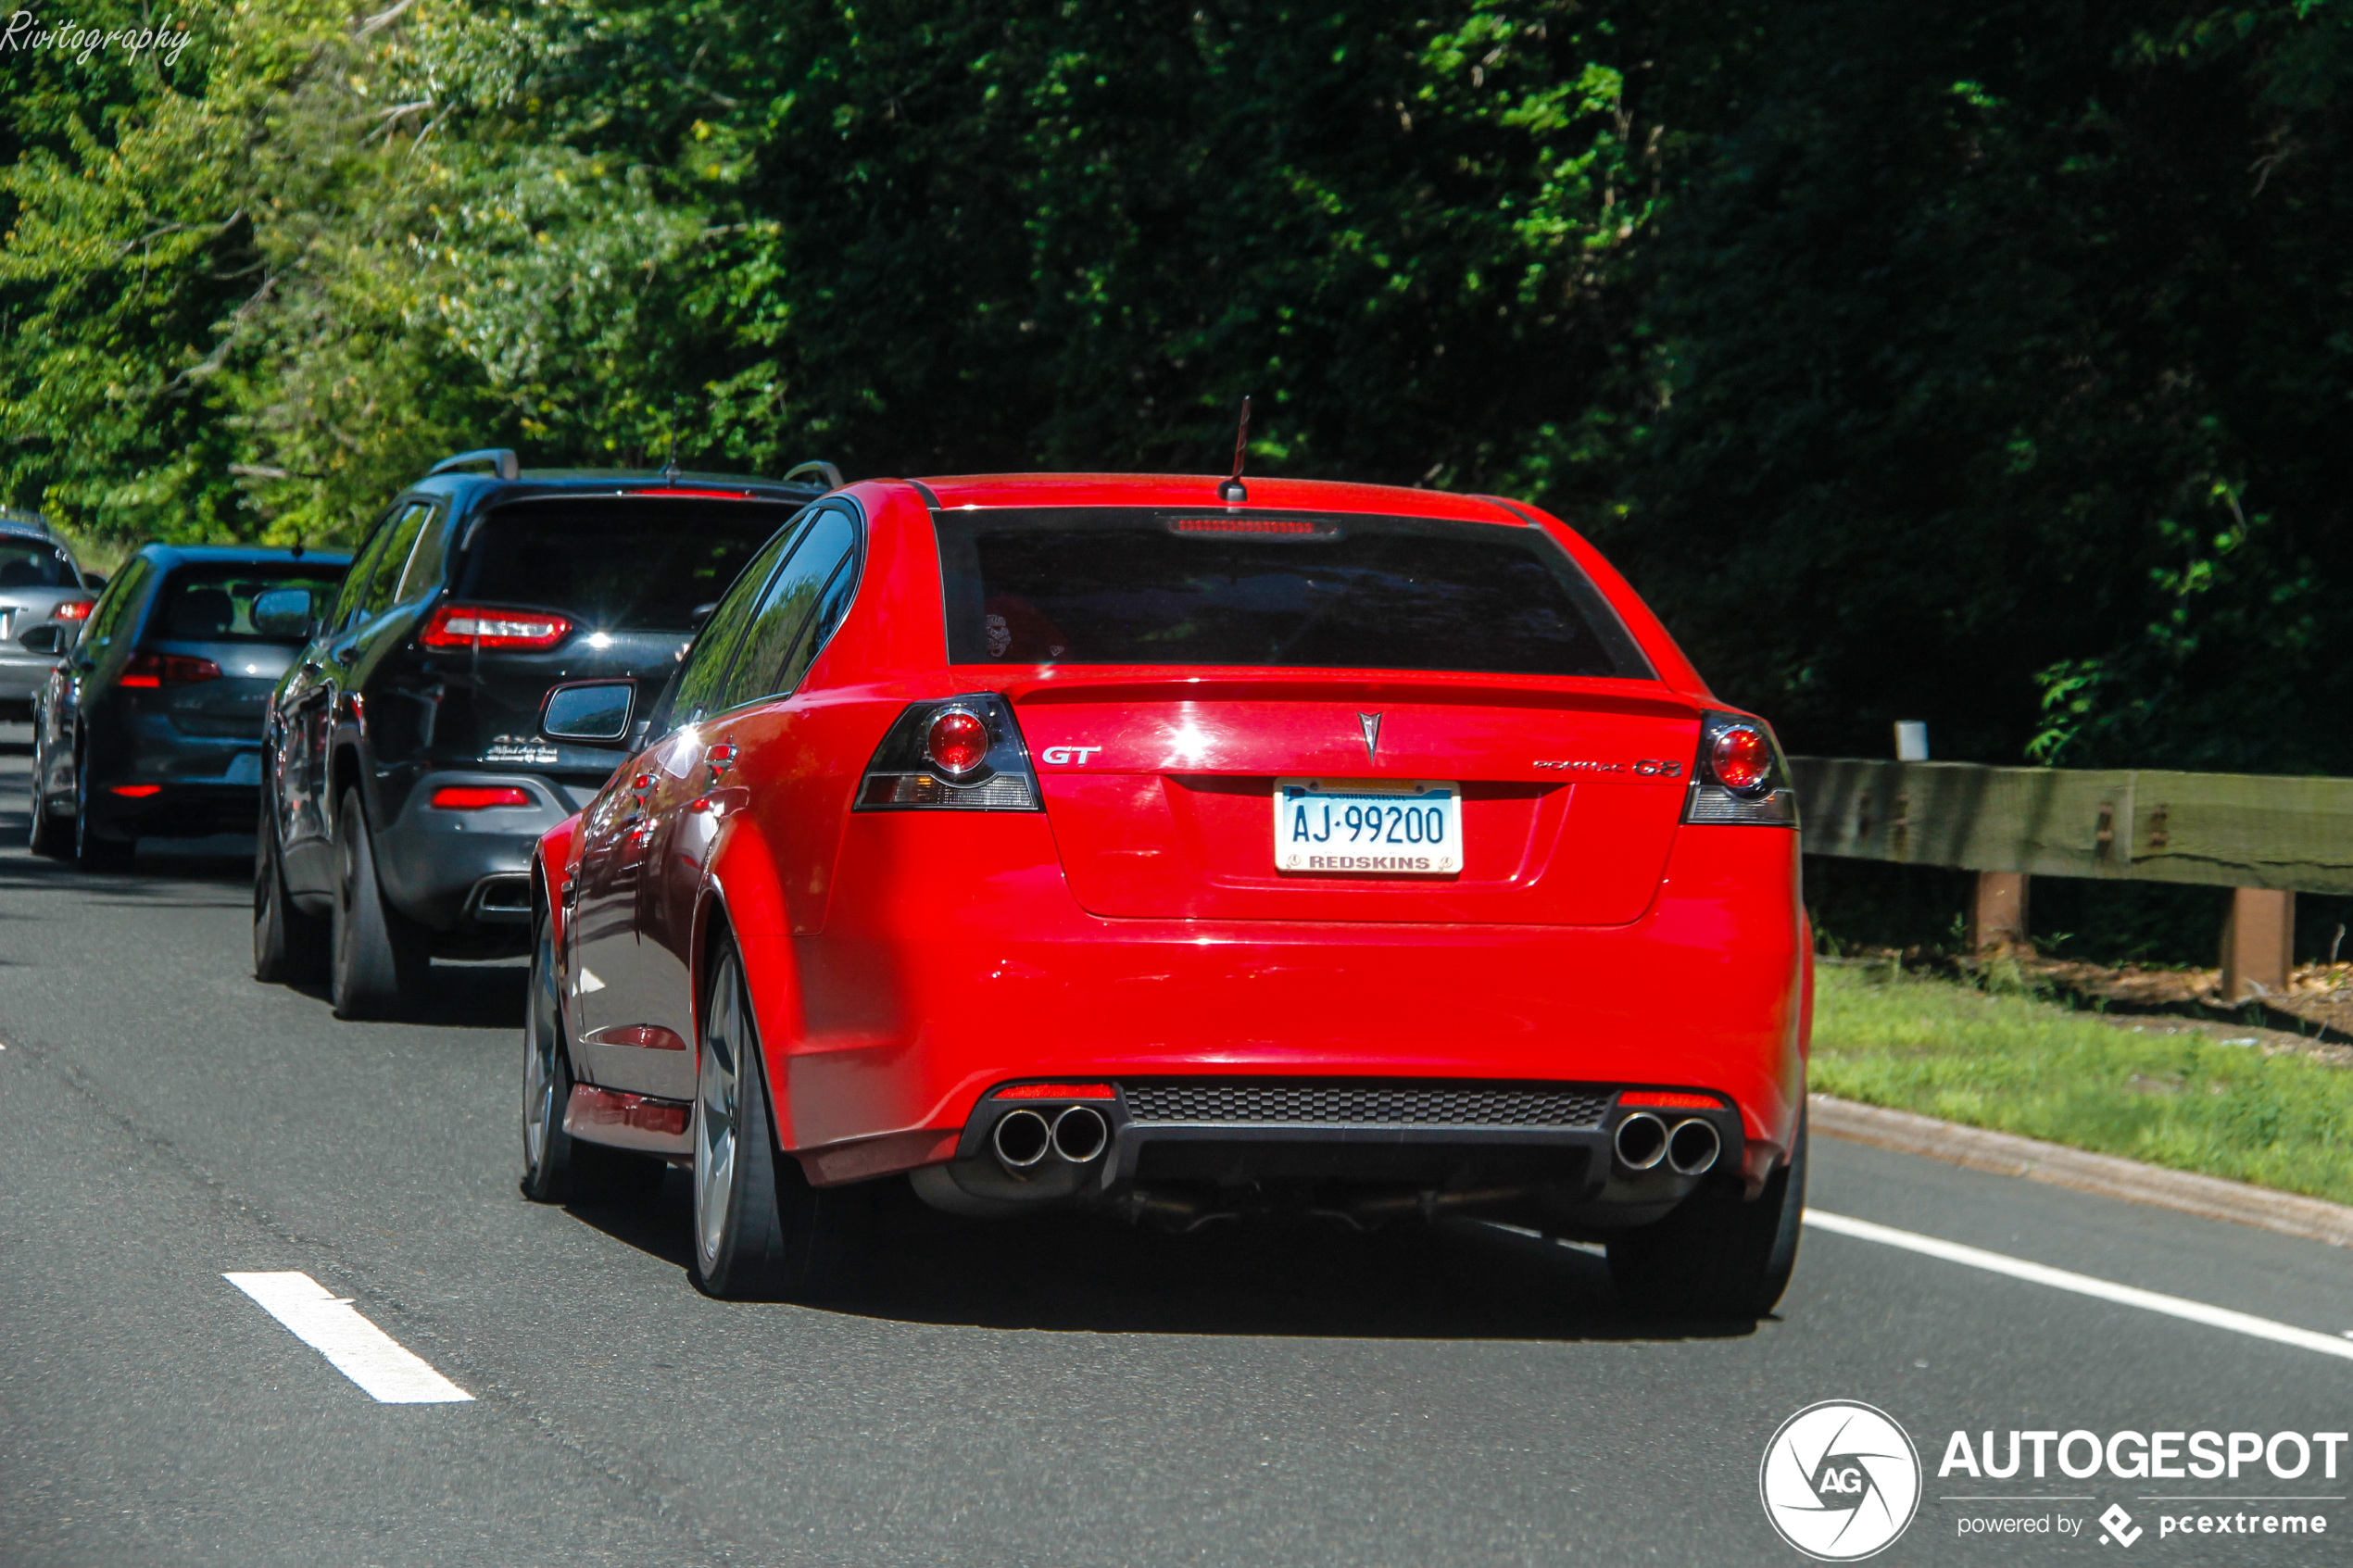 Pontiac G8 GT - 28 March 2020 - Autogespot